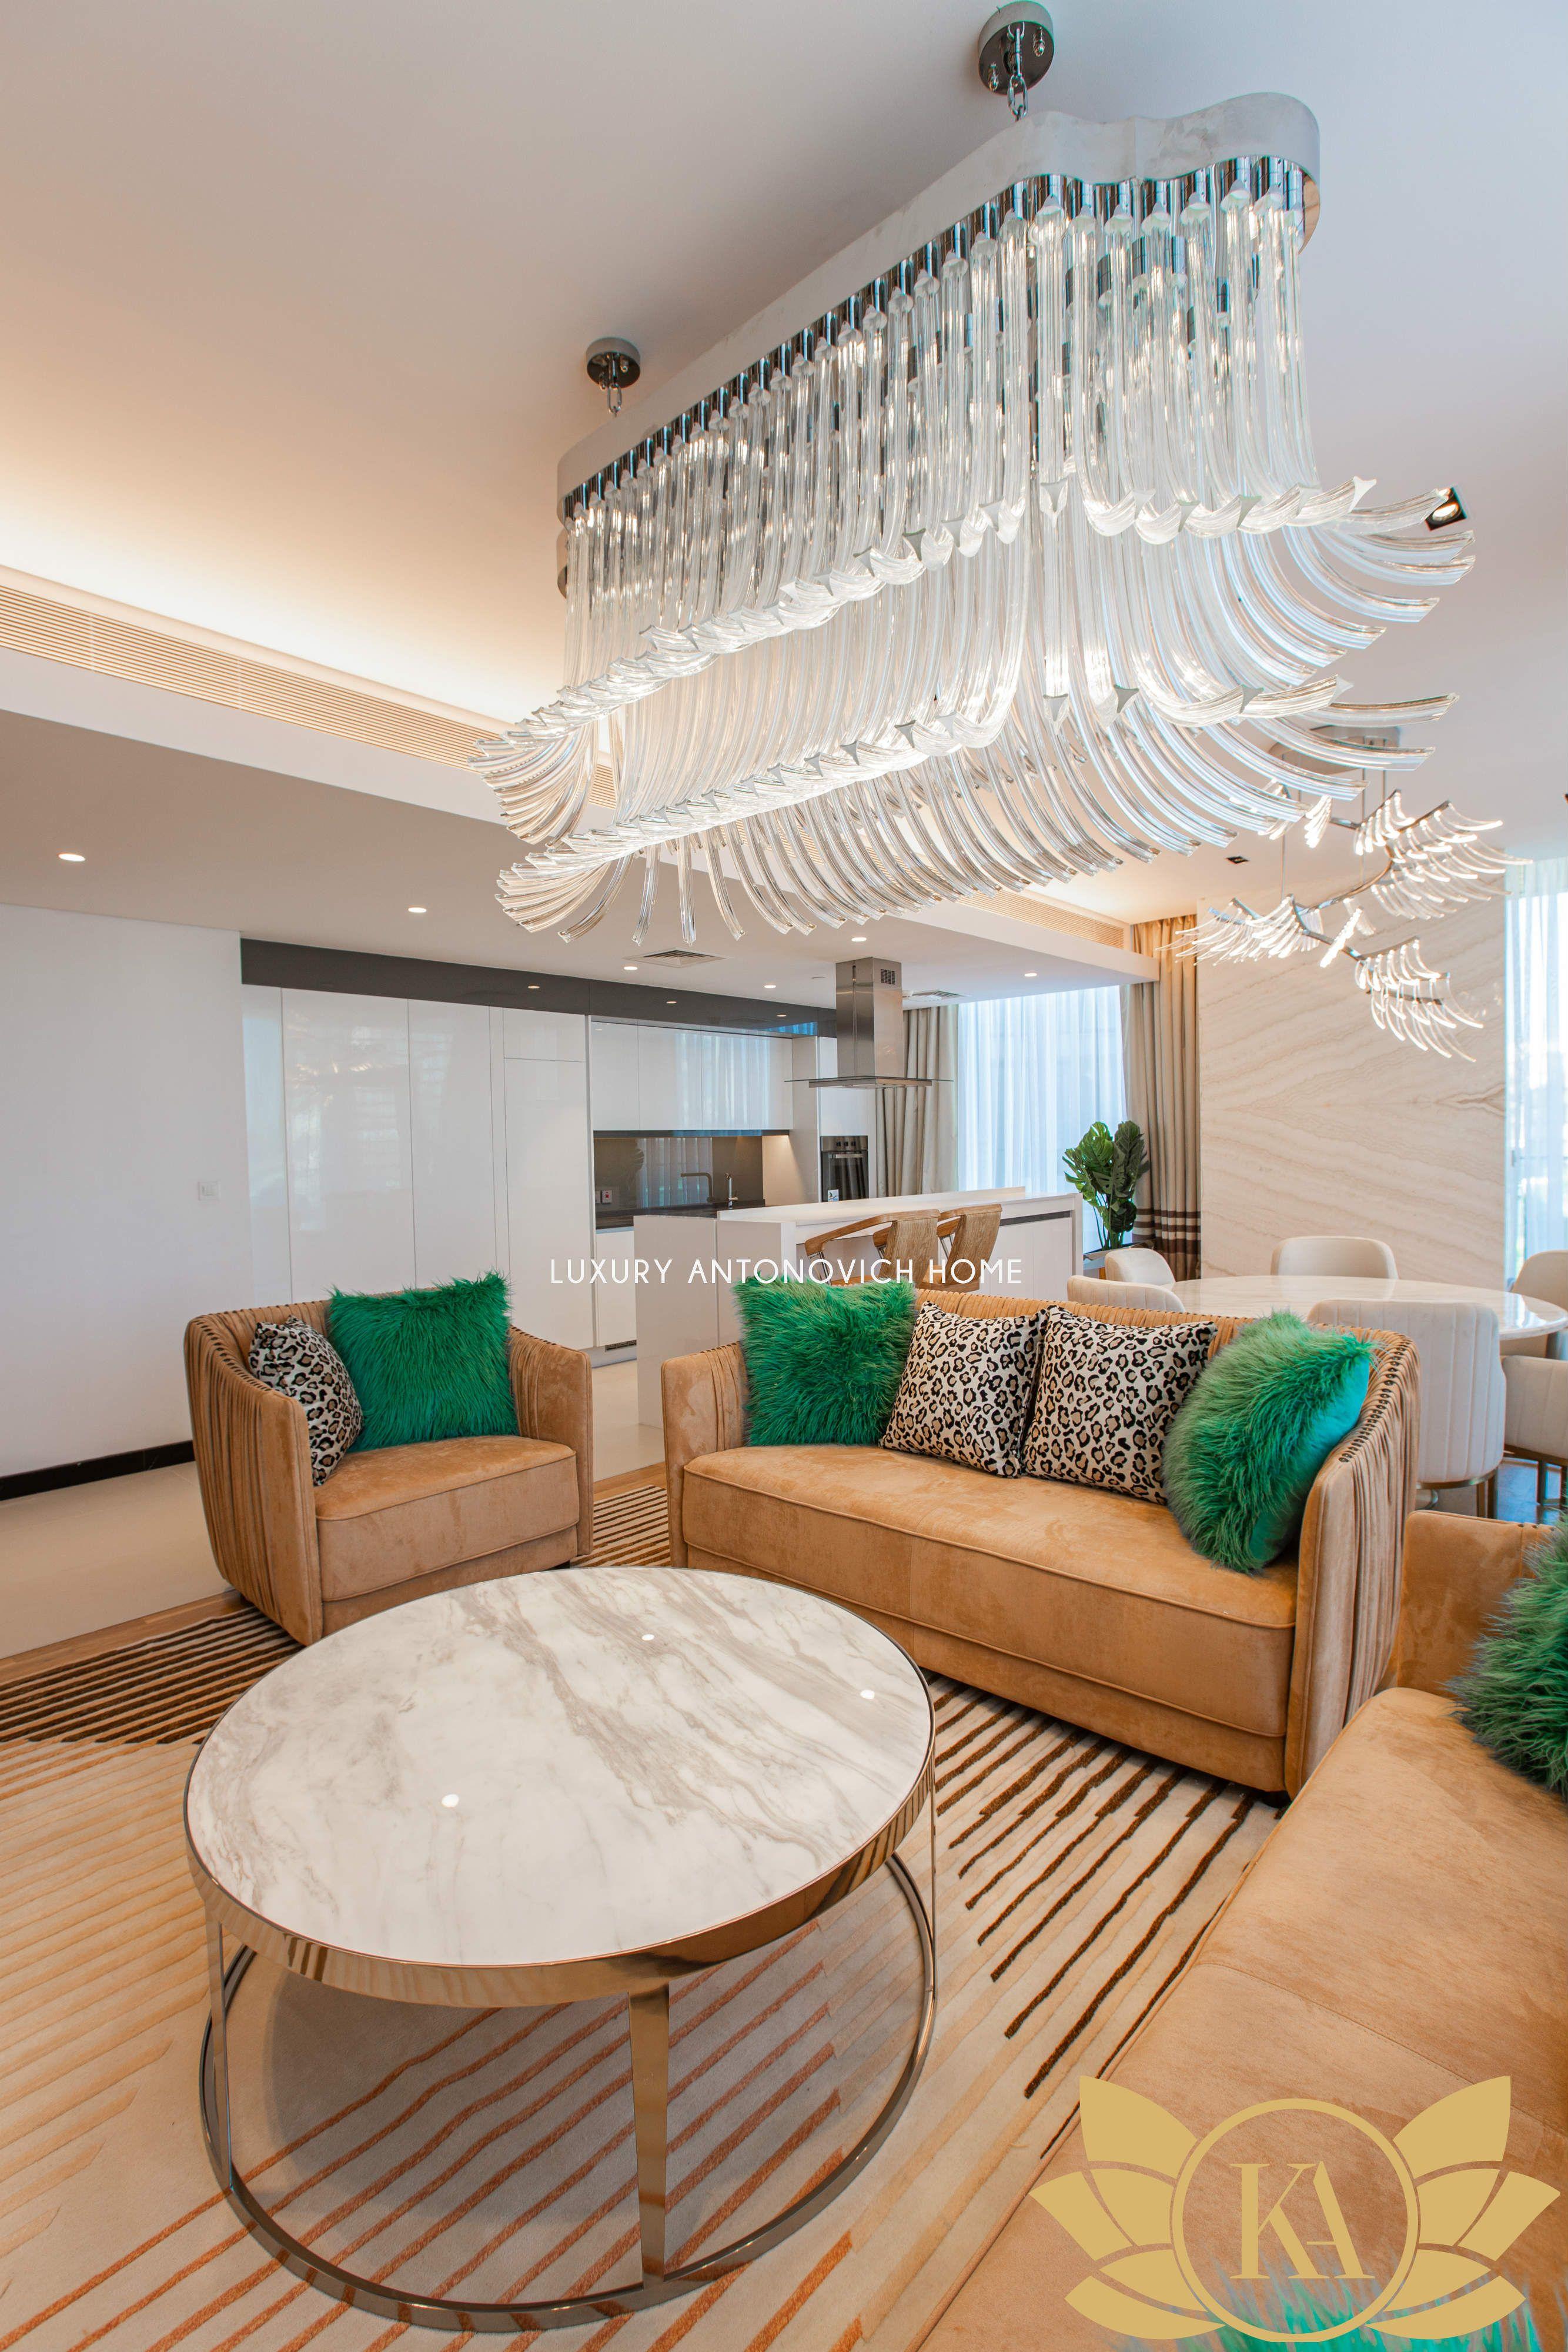 Modern Furniture Shopping Service In 2020 Interior Design Companies Exclusive Furniture Best Interior Design